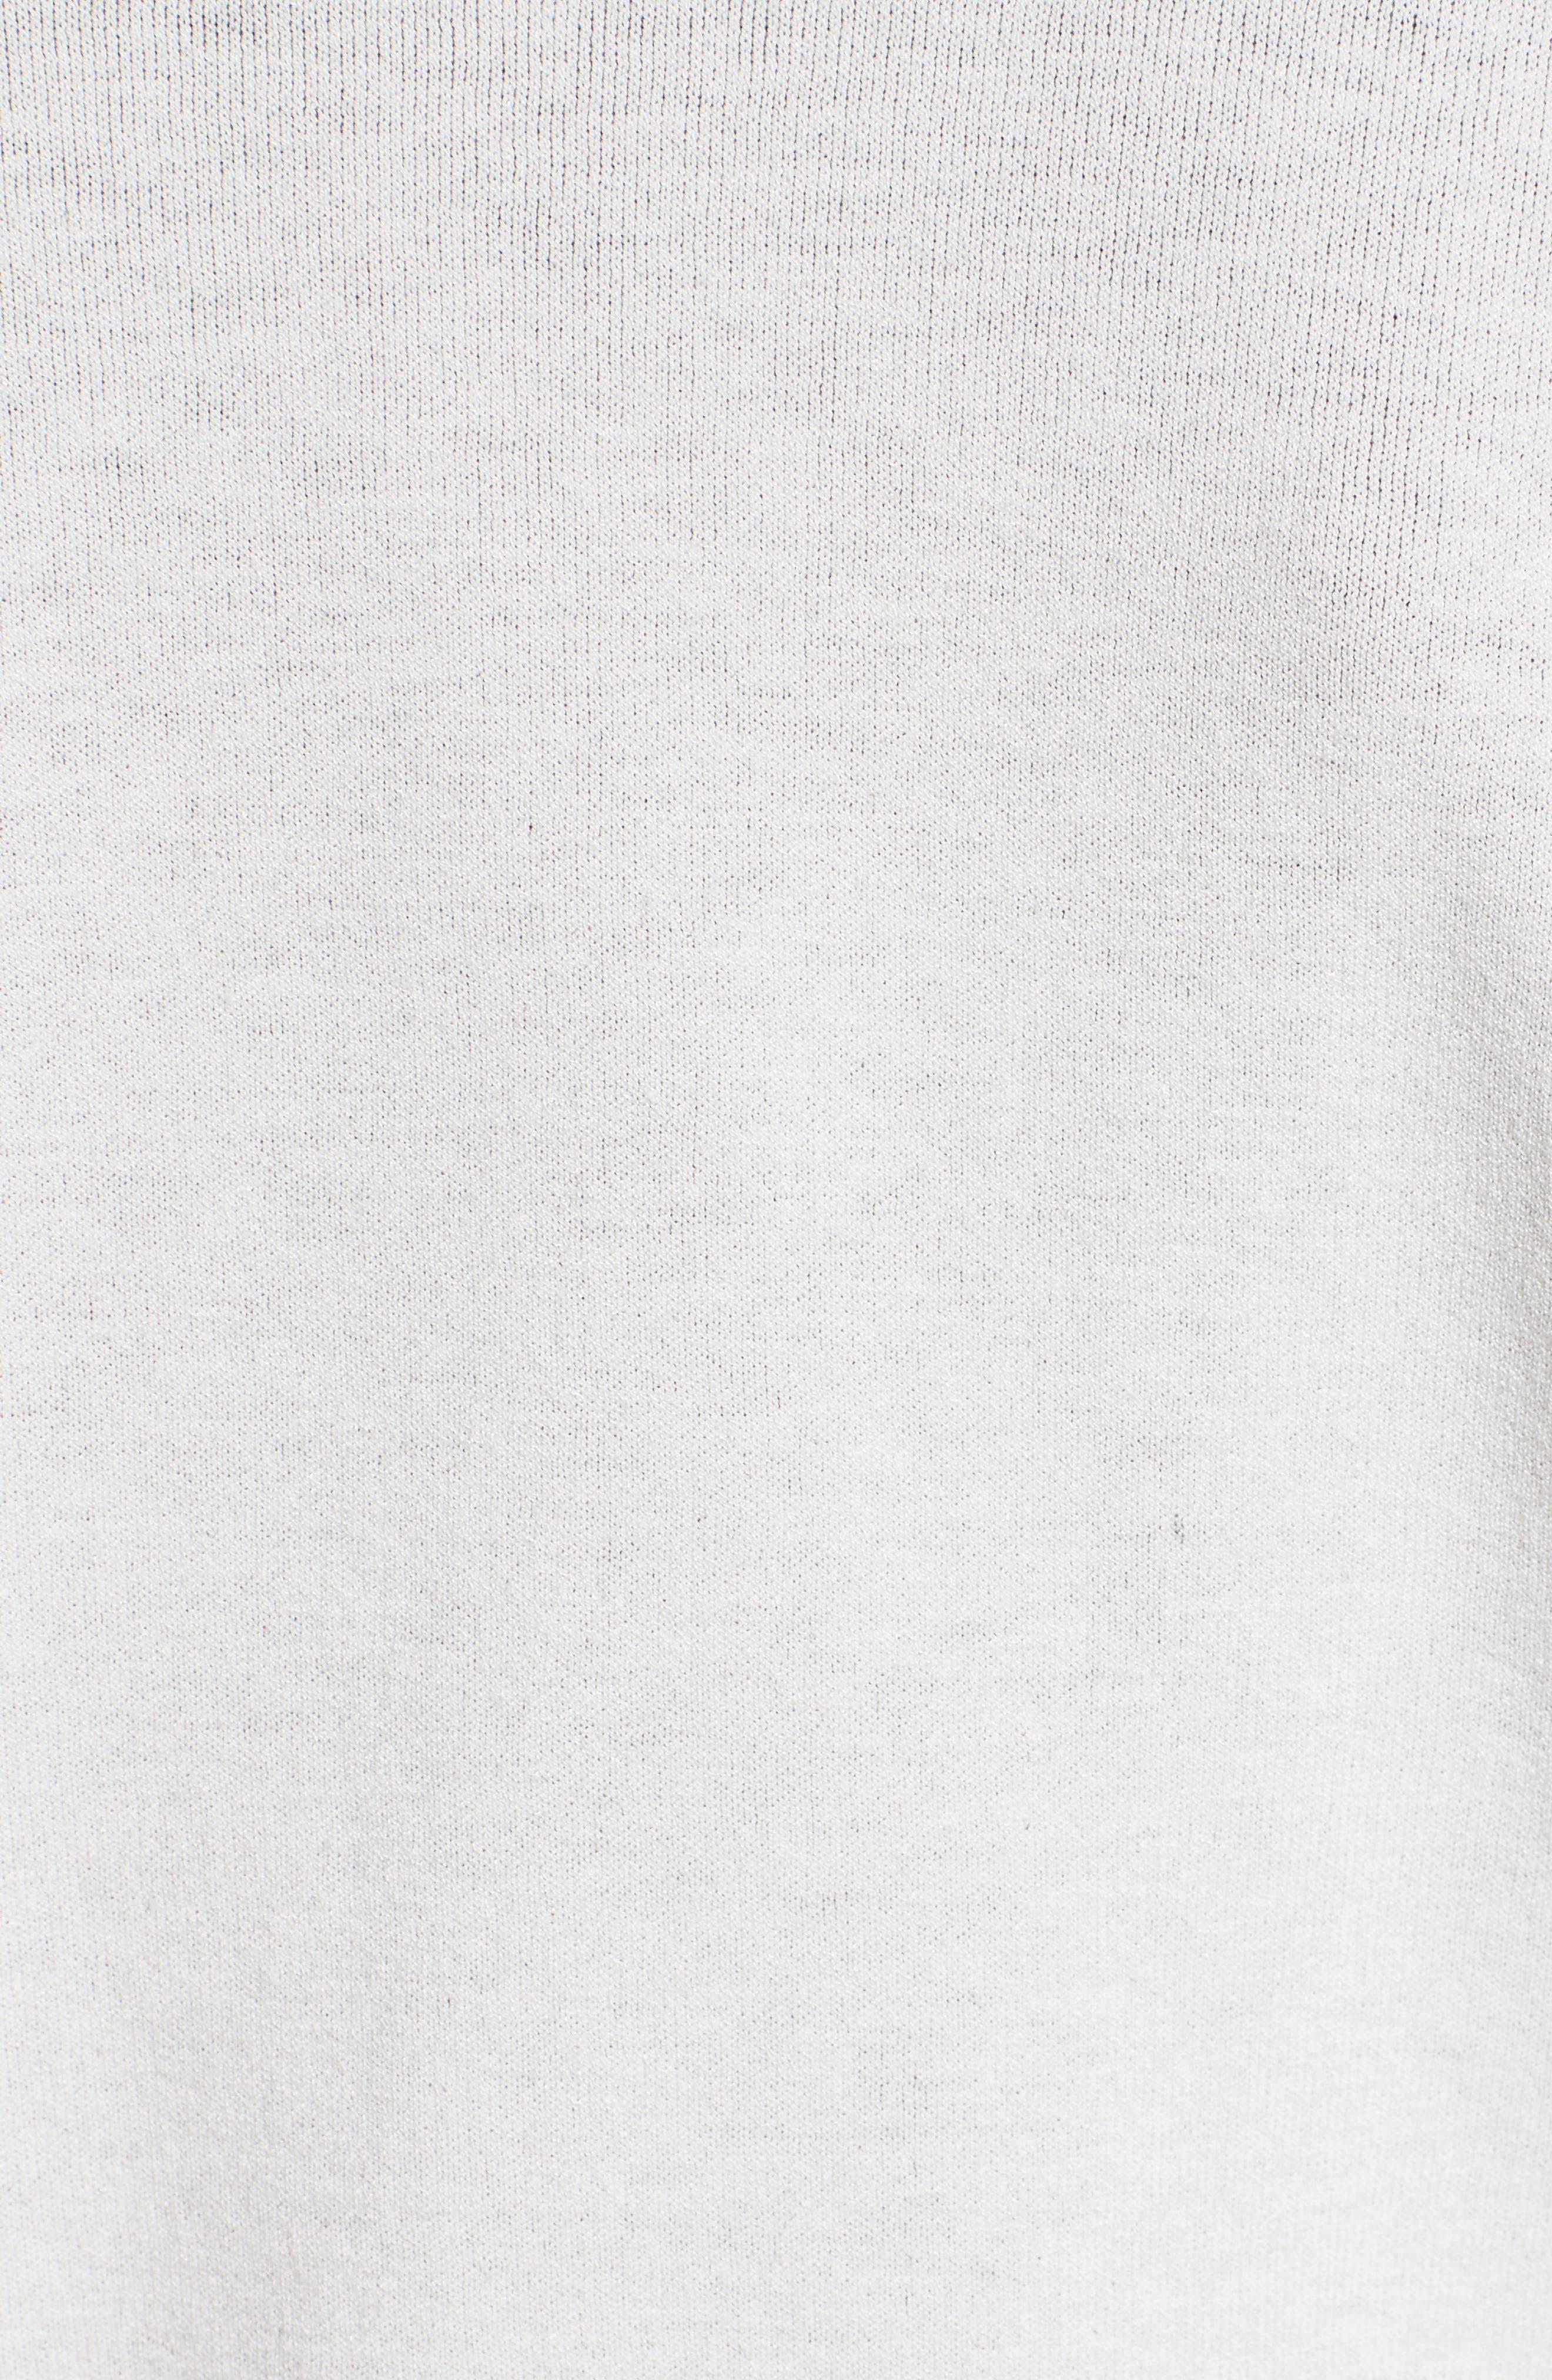 Matte Crepe Reversible Knit Bomber Jacket,                             Alternate thumbnail 4, color,                             Cloud / Black